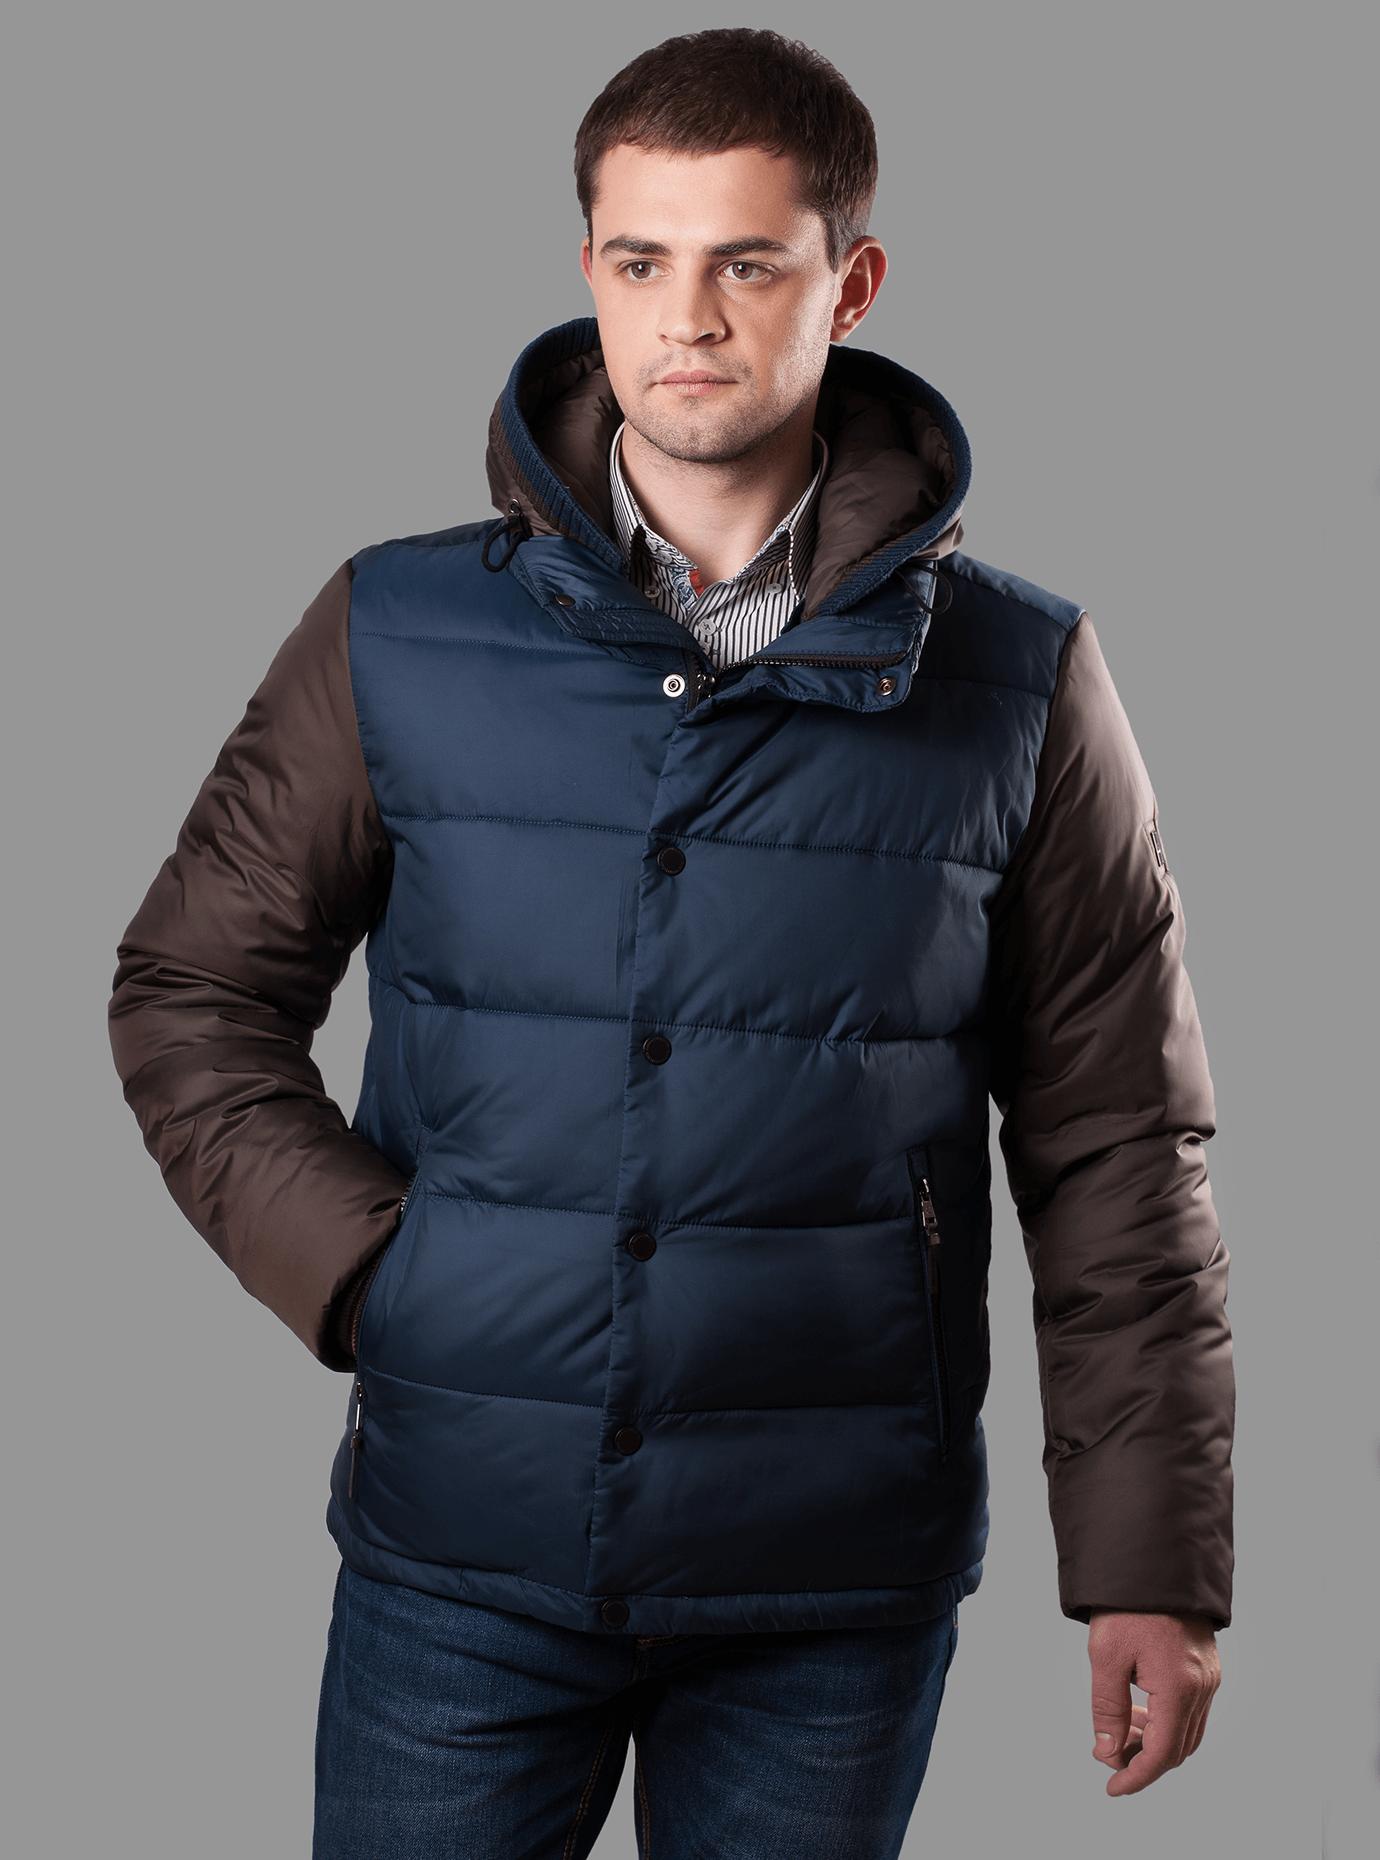 Зимняя мужская куртка Синий 46 (02-MC19193): фото - Alster.ua